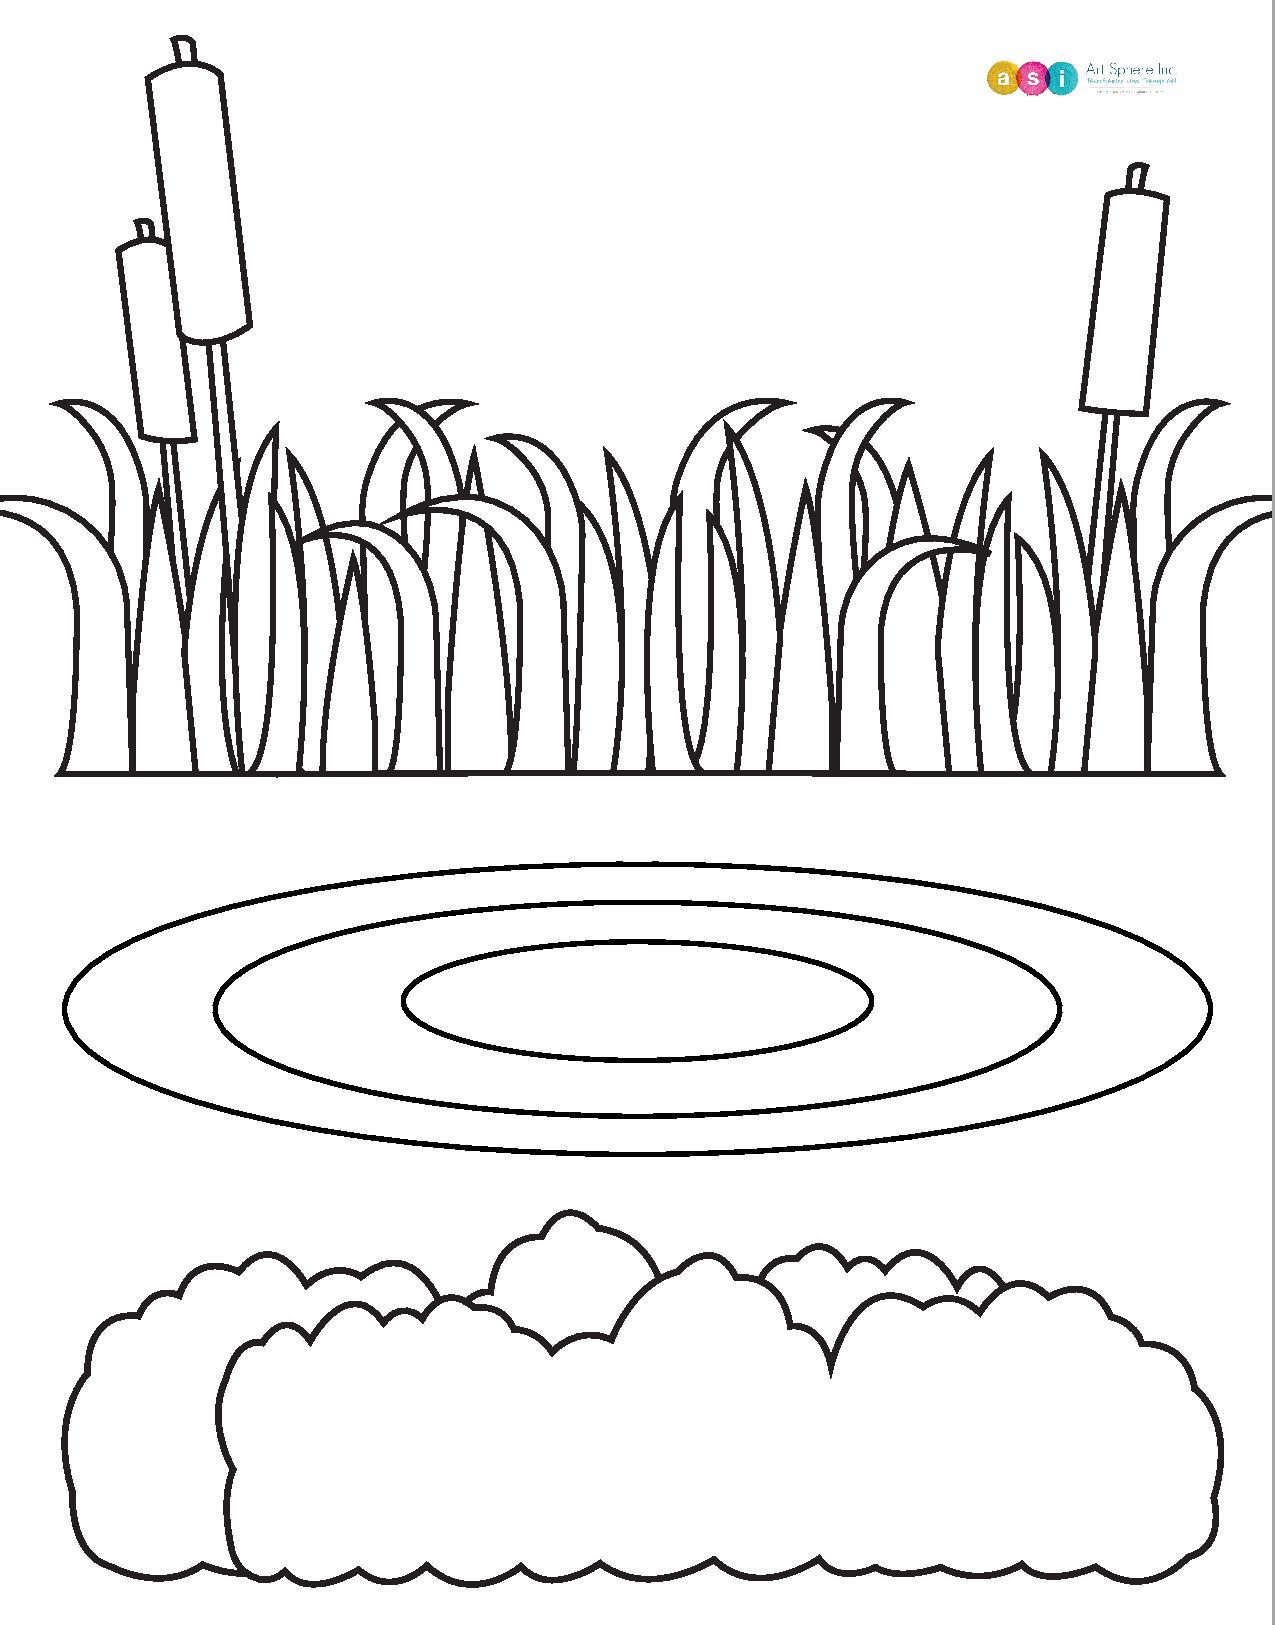 Free Pond Template Handout